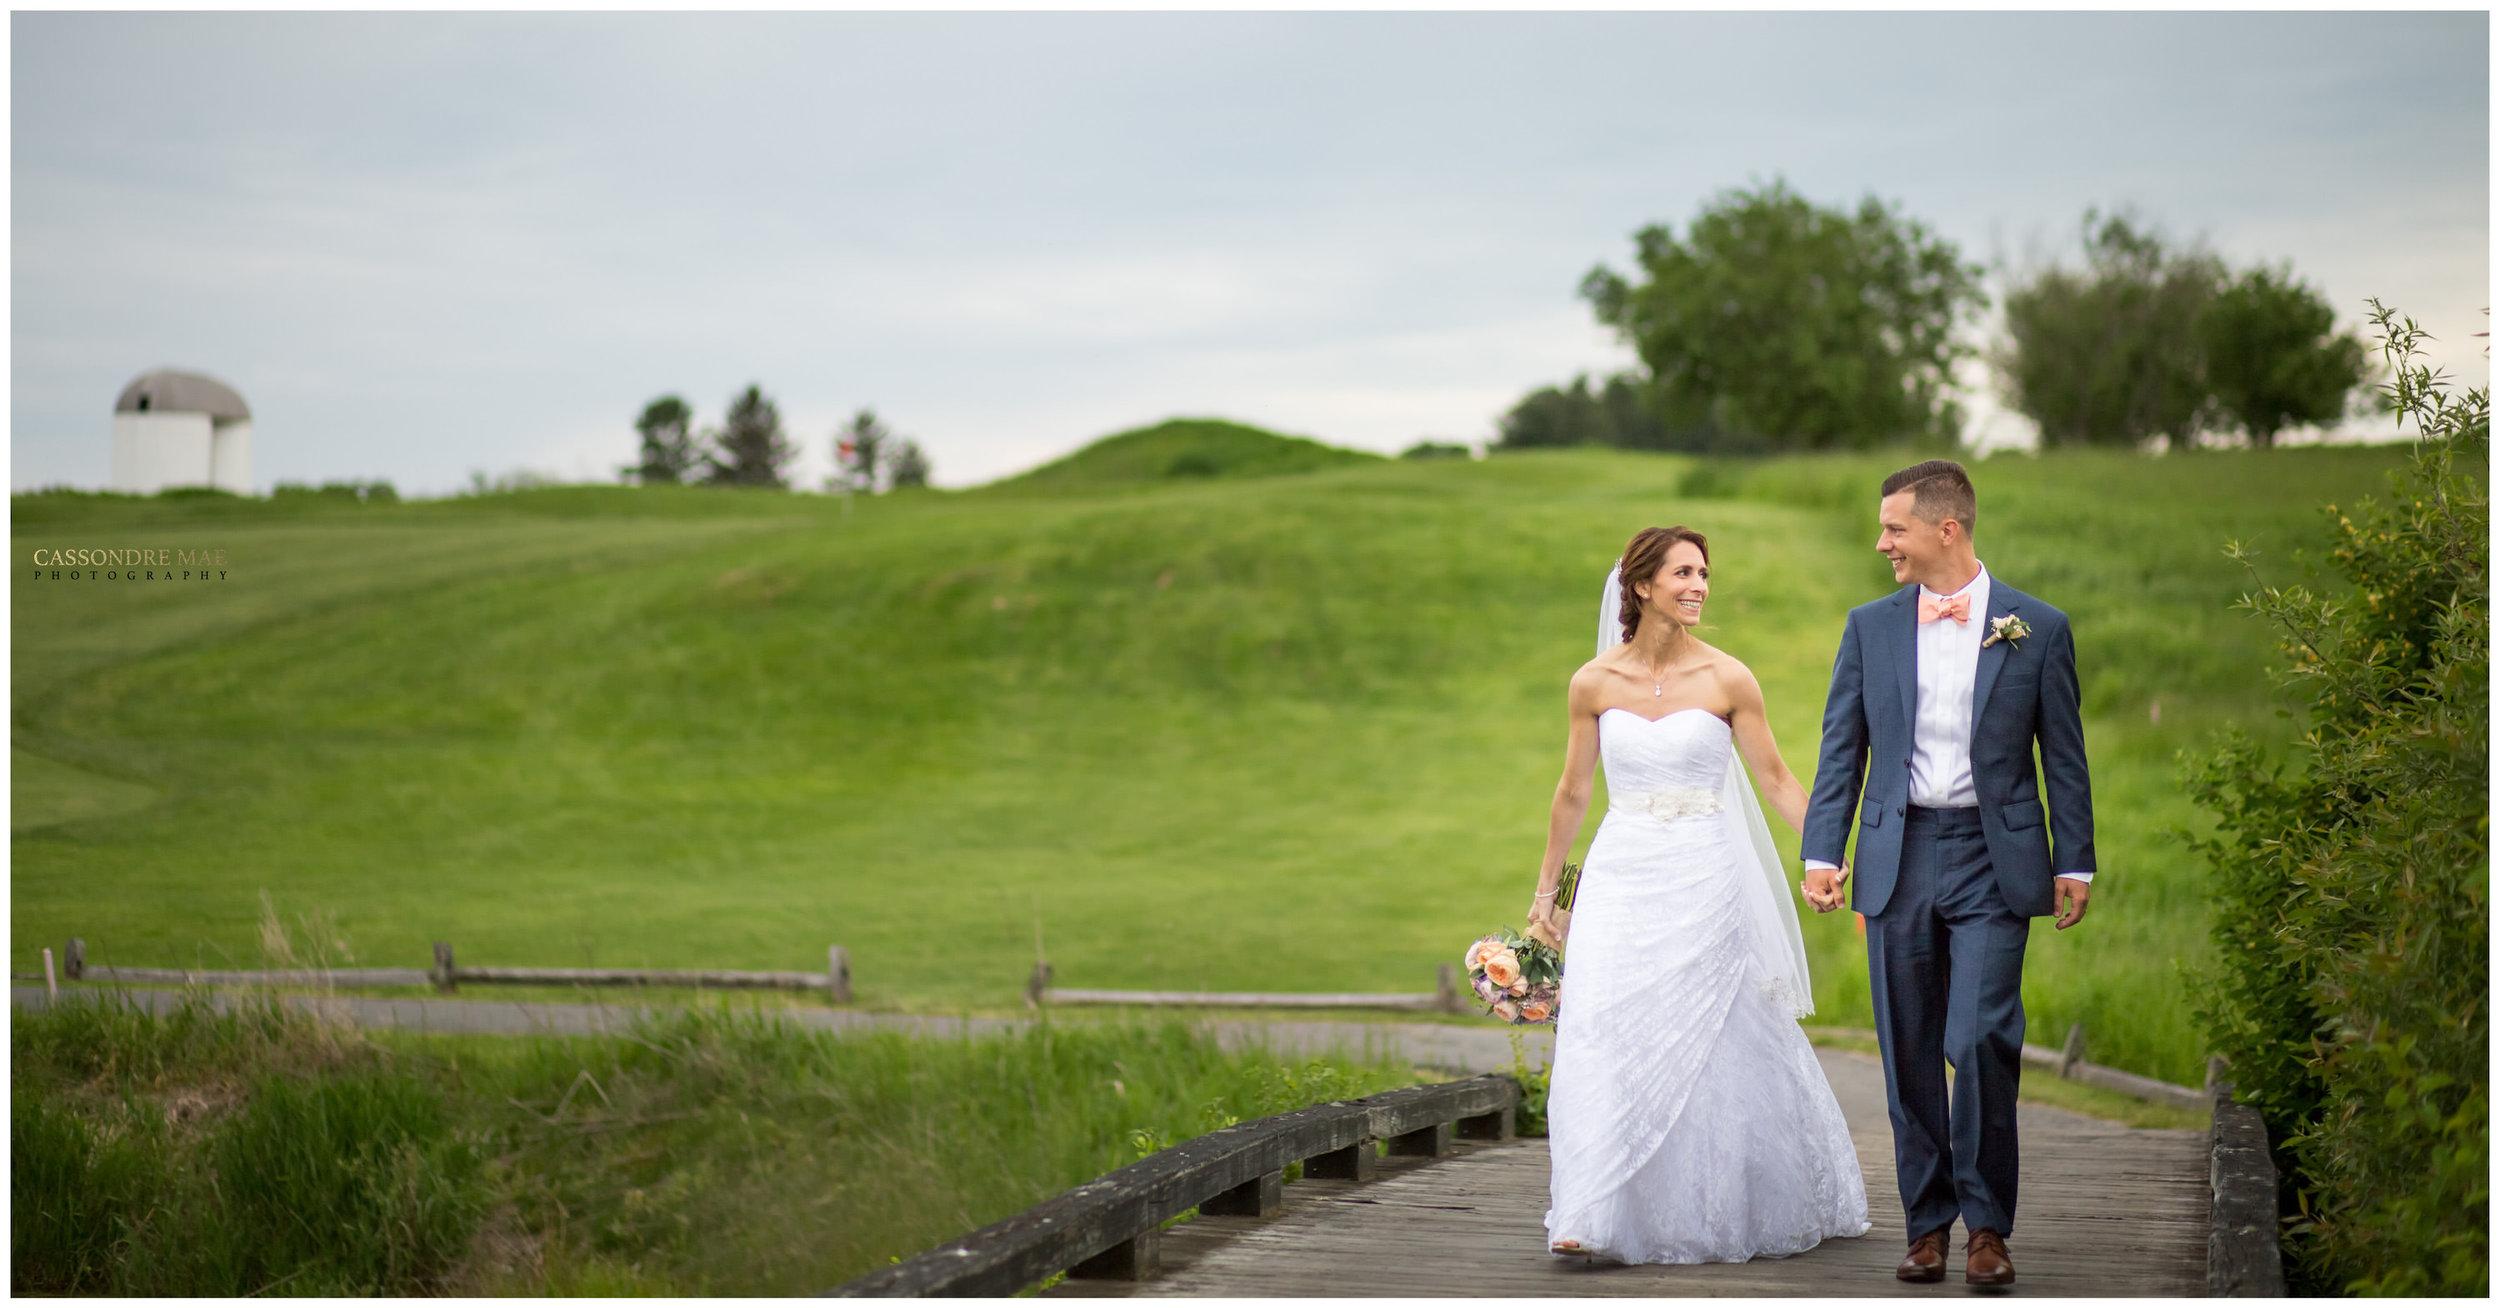 Cassondre Mae Photography Links at Unionvale Wedding 18.jpg